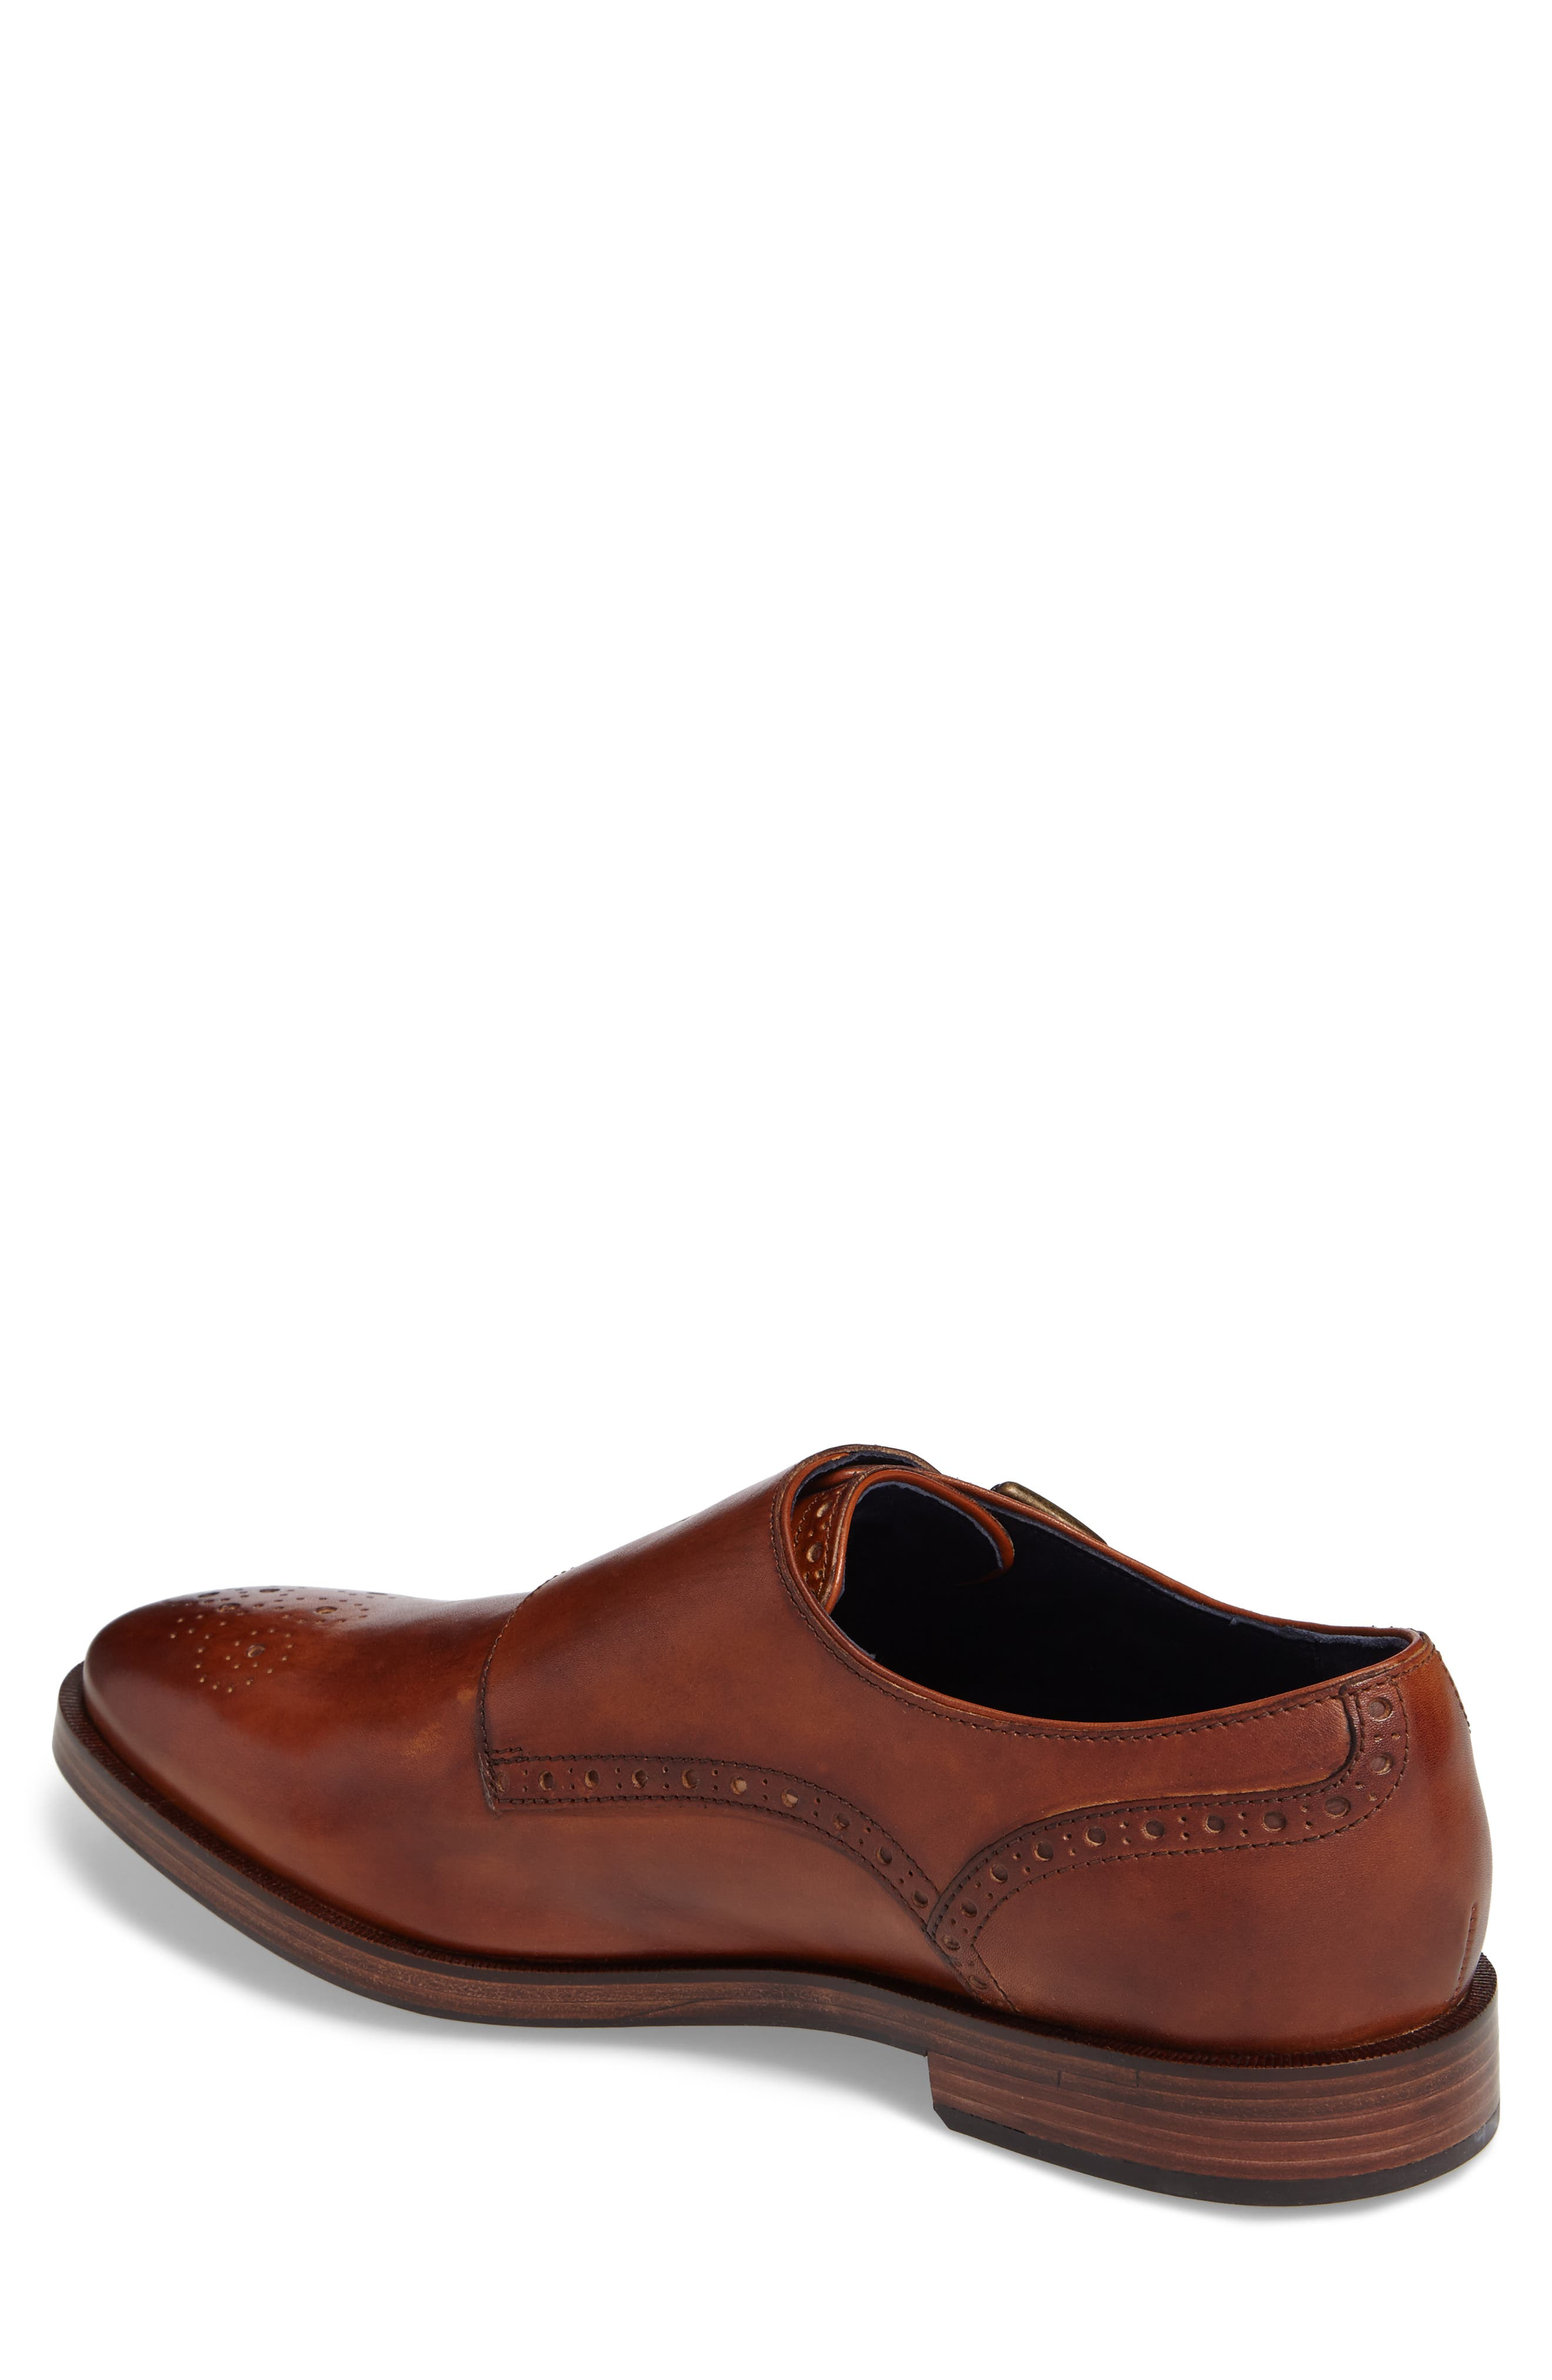 Hamilton Double Monk Strap Shoe,                             Alternate thumbnail 2, color,                             BRITISH TAN LEATHER